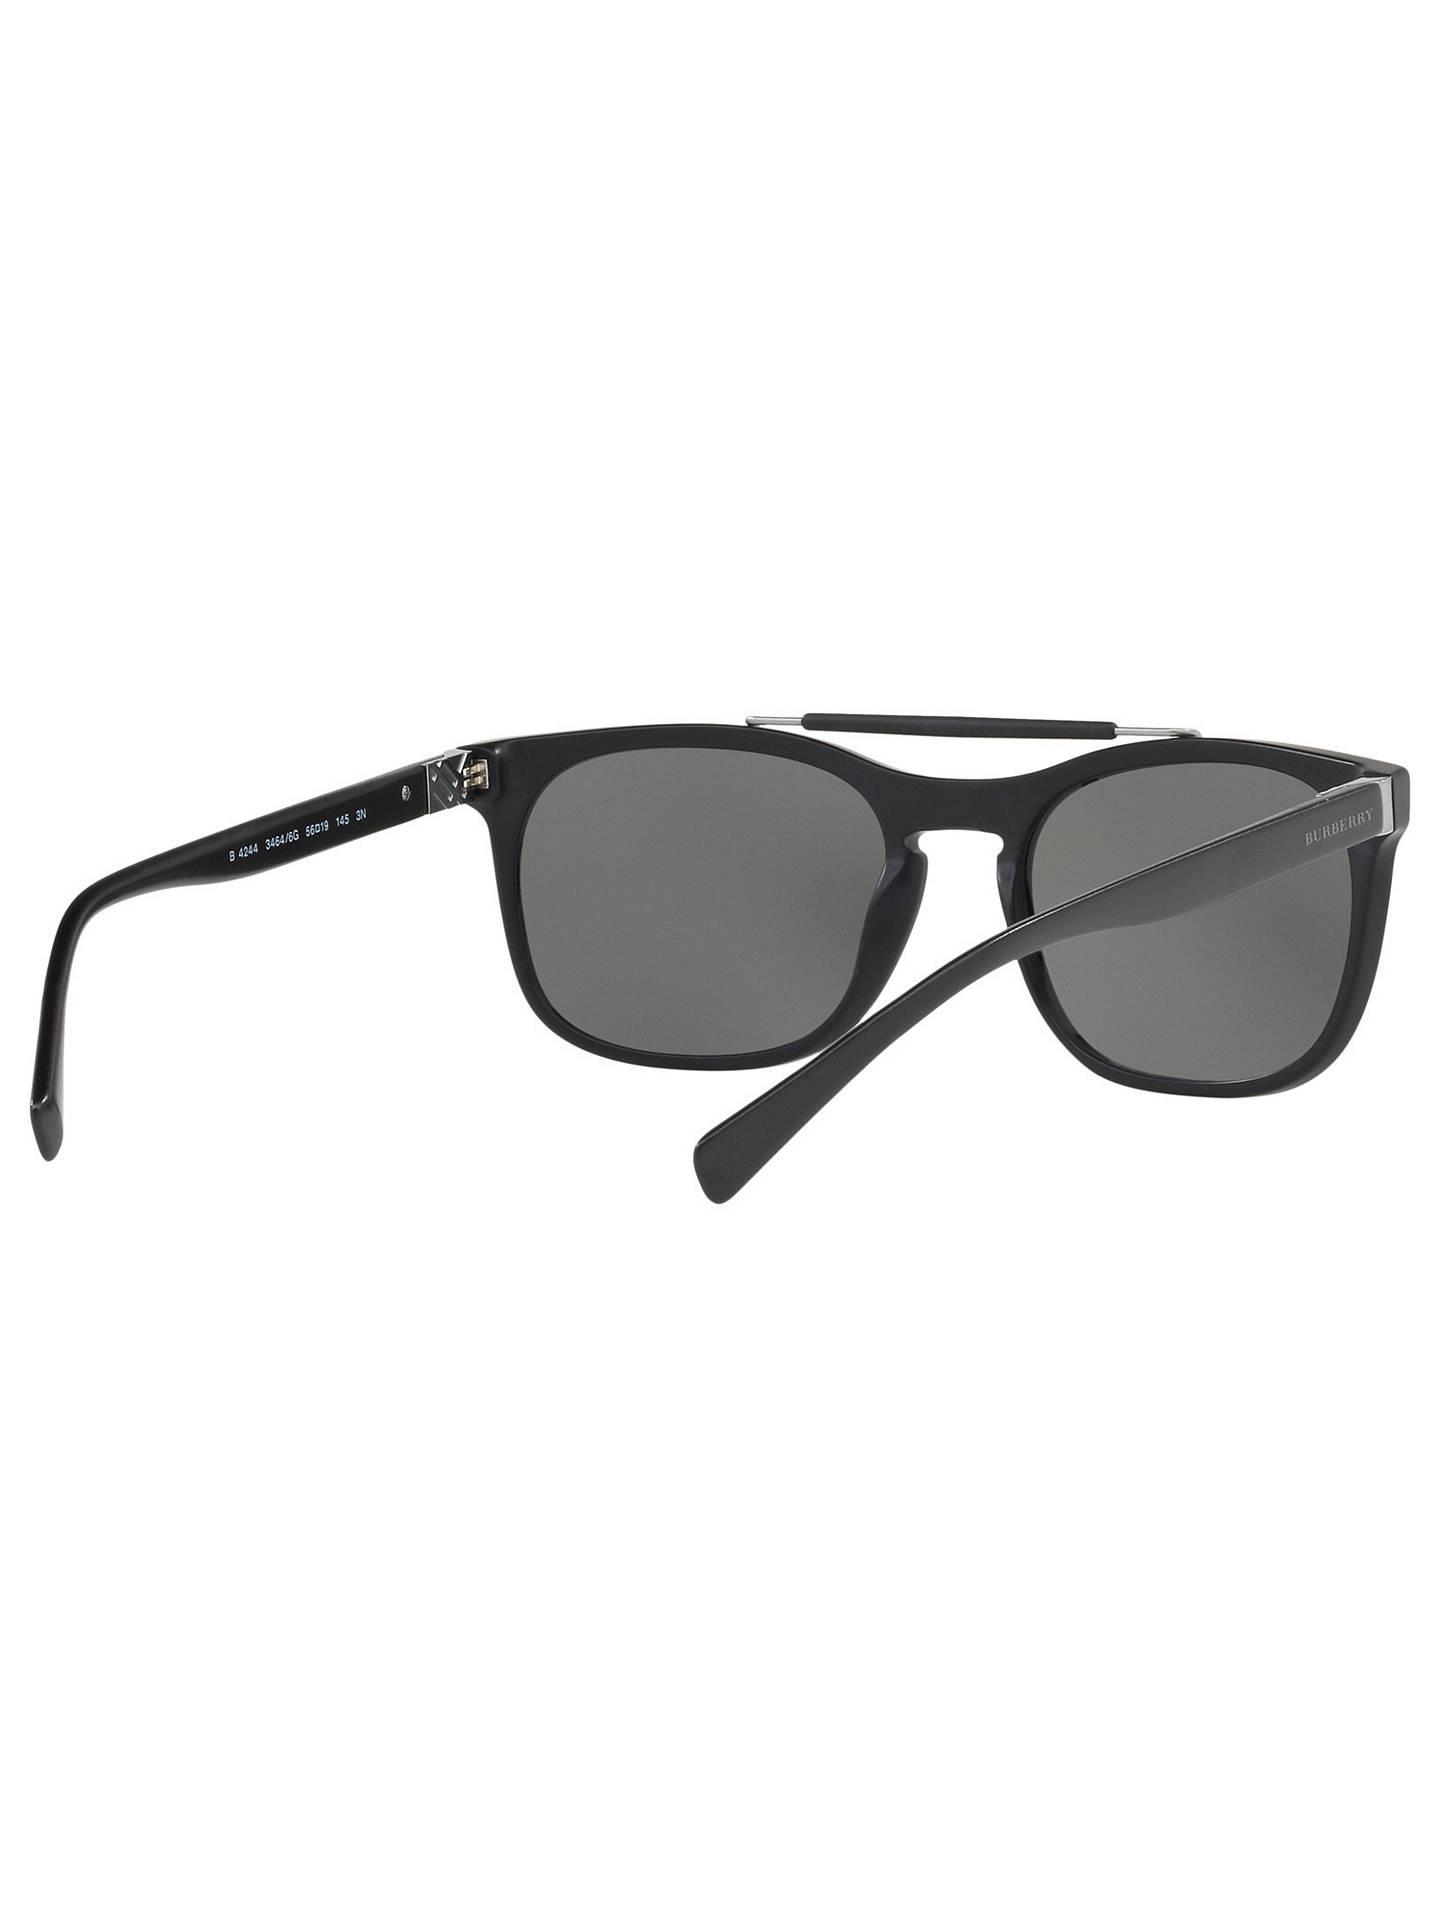 870dfe3faad ... Buy Burberry BE4244 Square Sunglasses